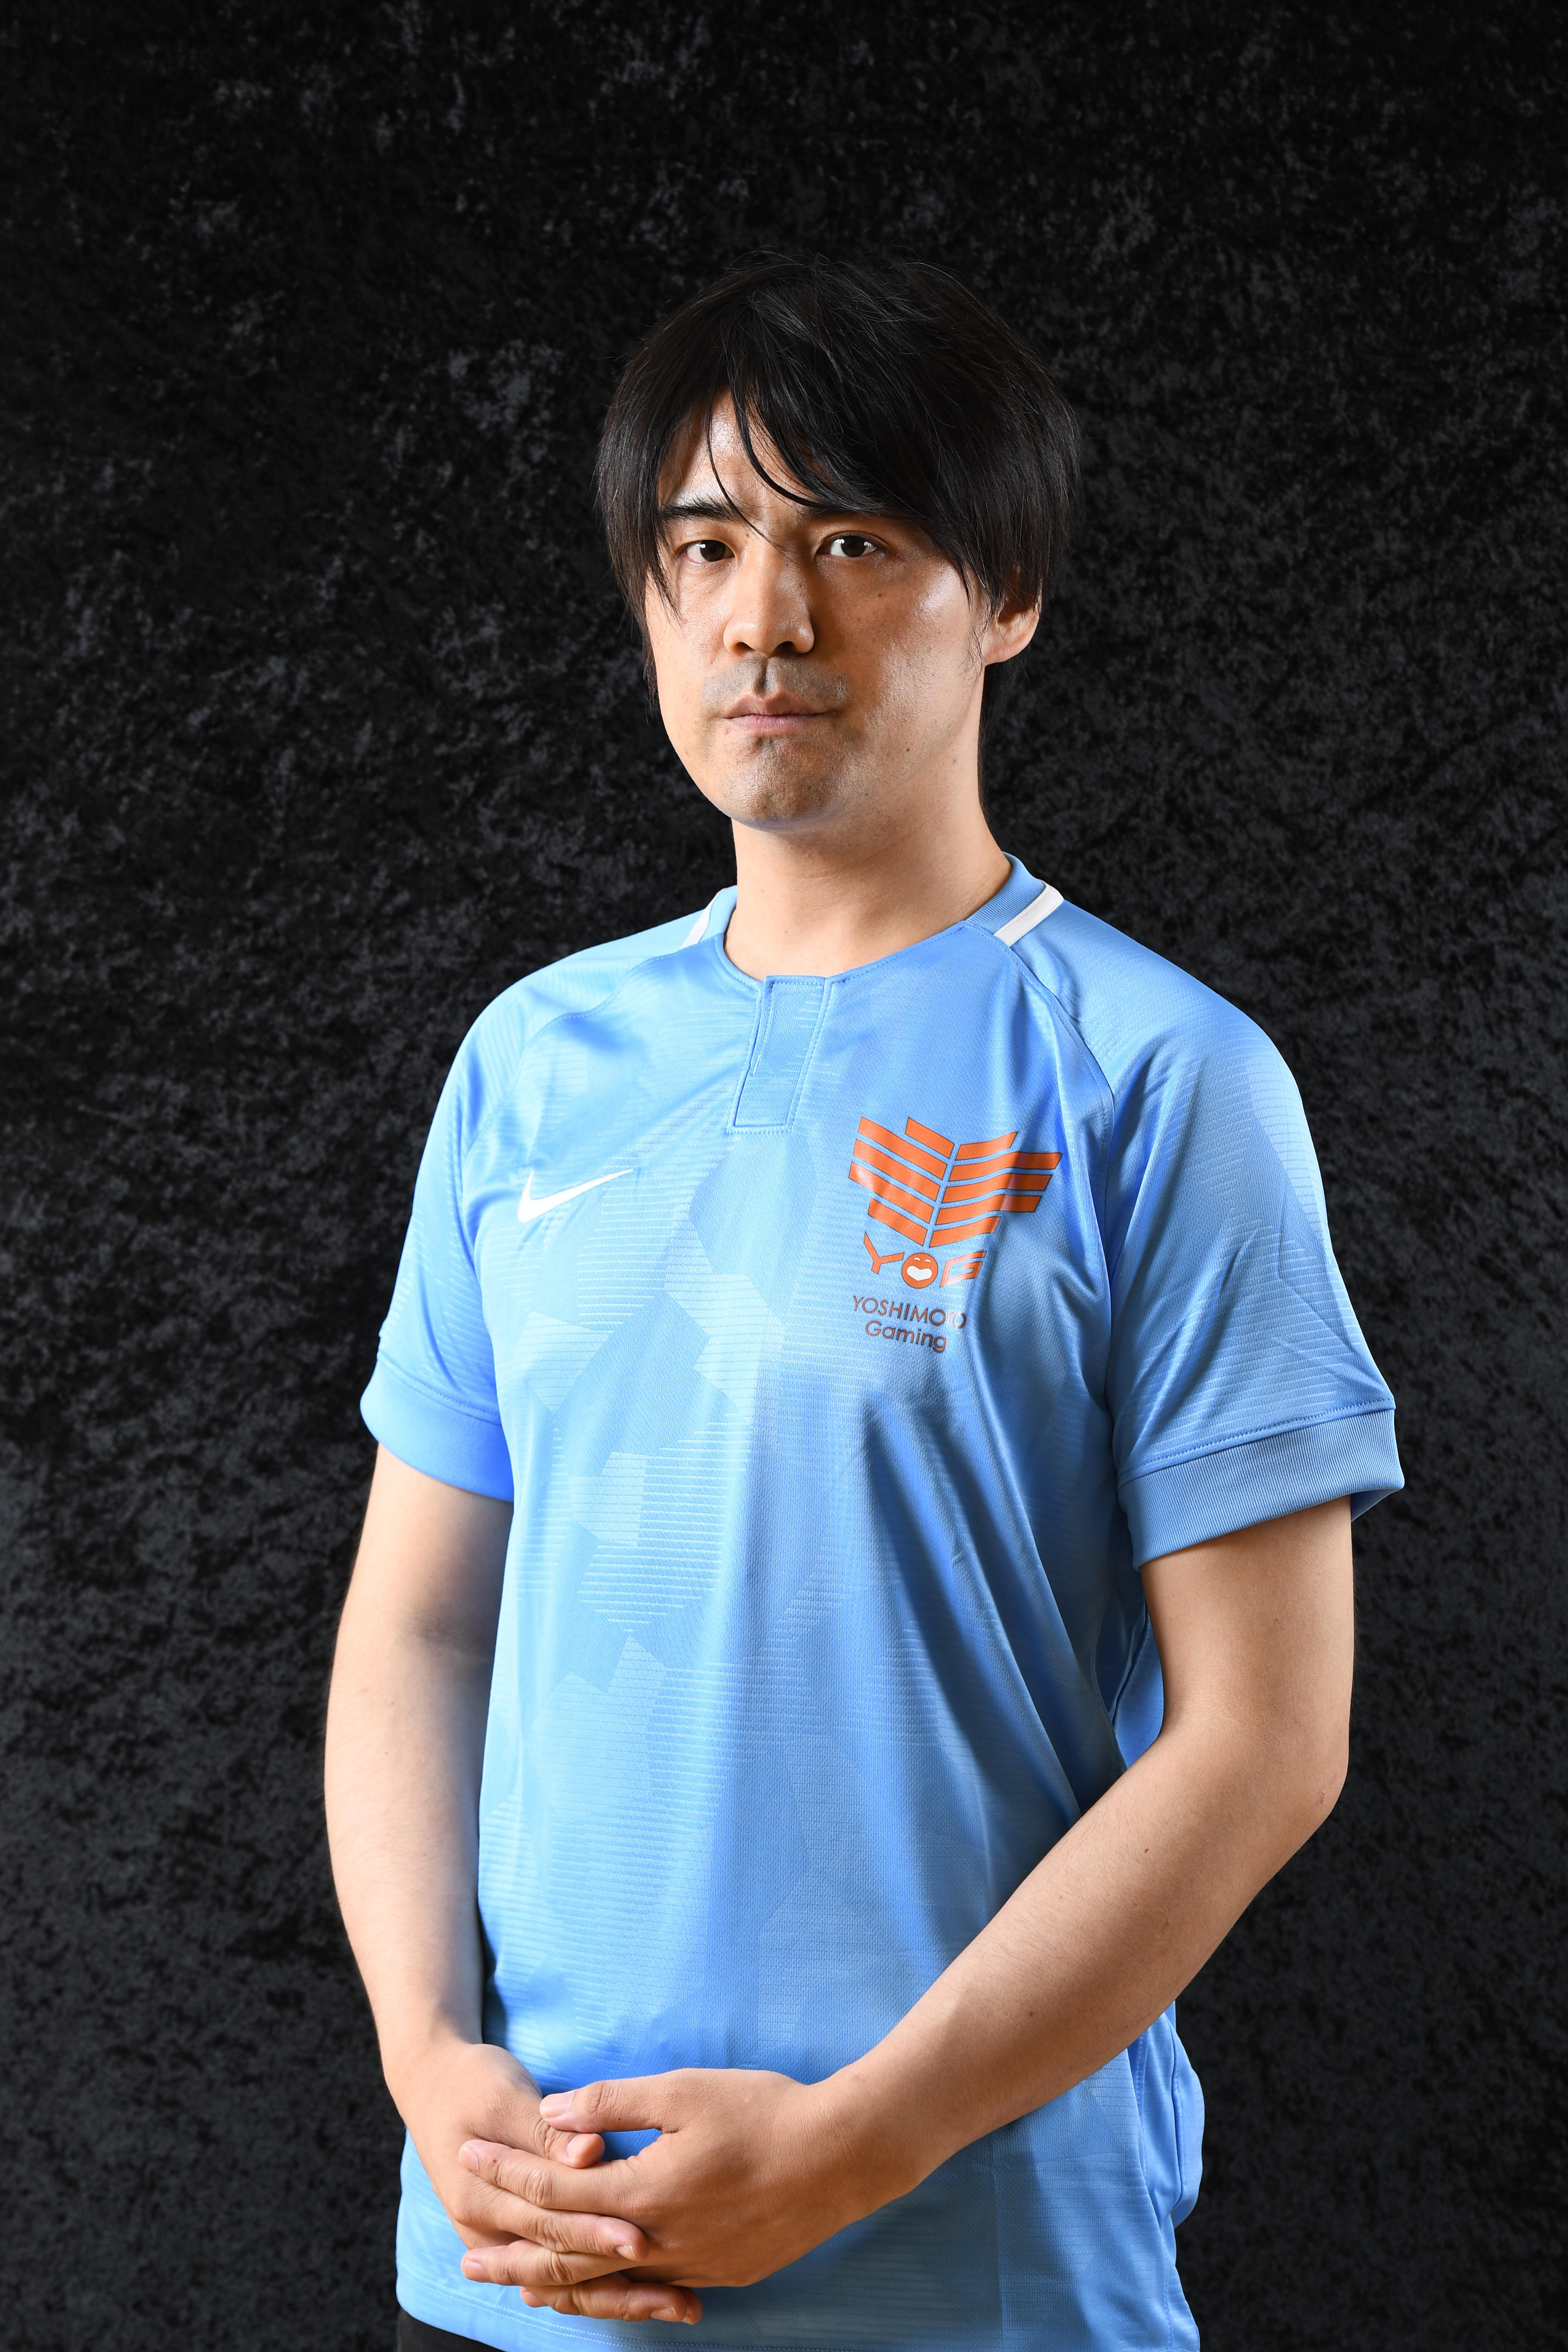 http://news.yoshimoto.co.jp/20180802223751-8c5535616f62bb8233ab343da3f5662abd1c9e9c.jpg